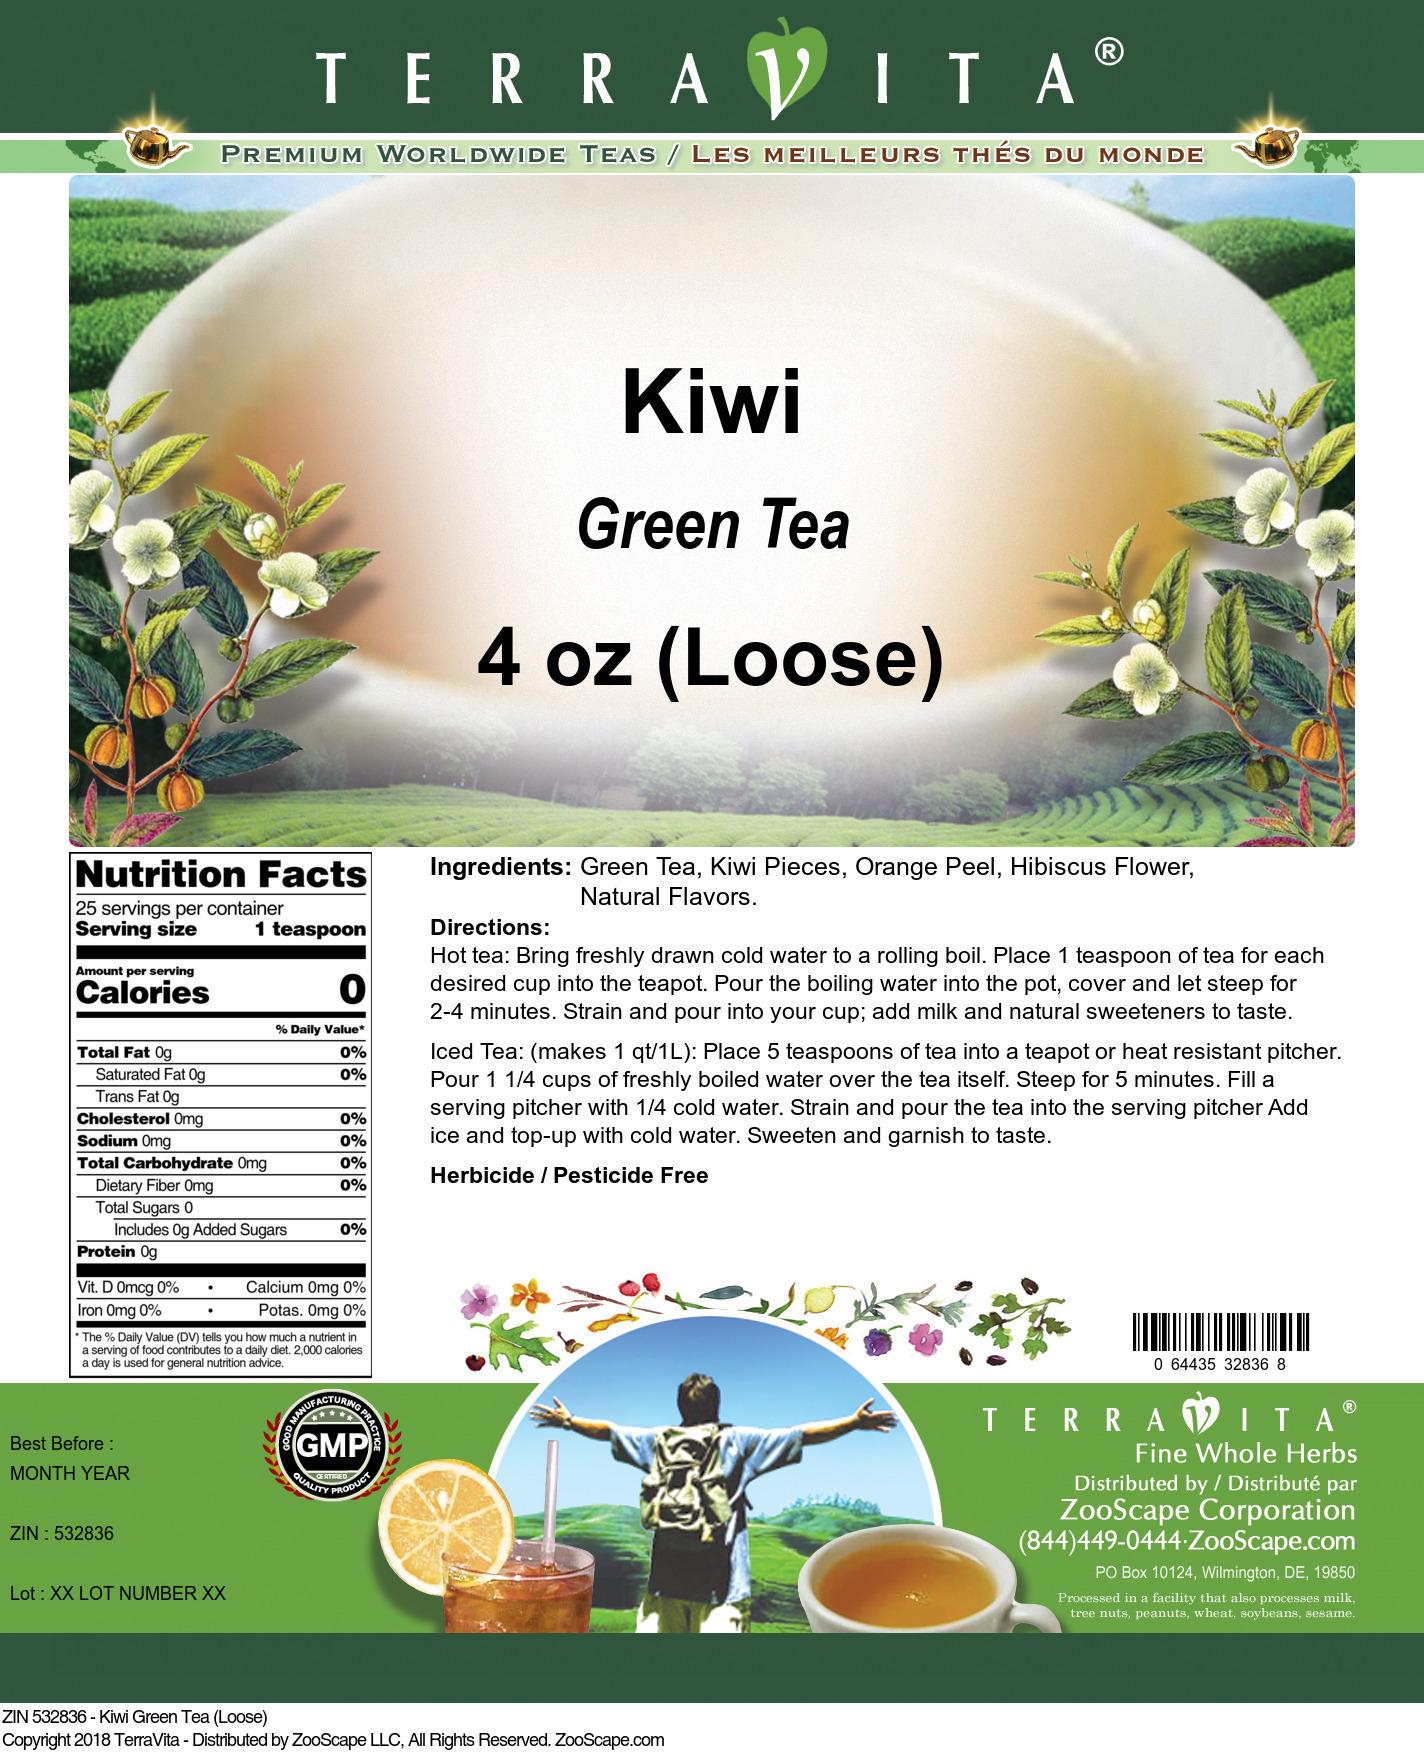 Kiwi Green Tea